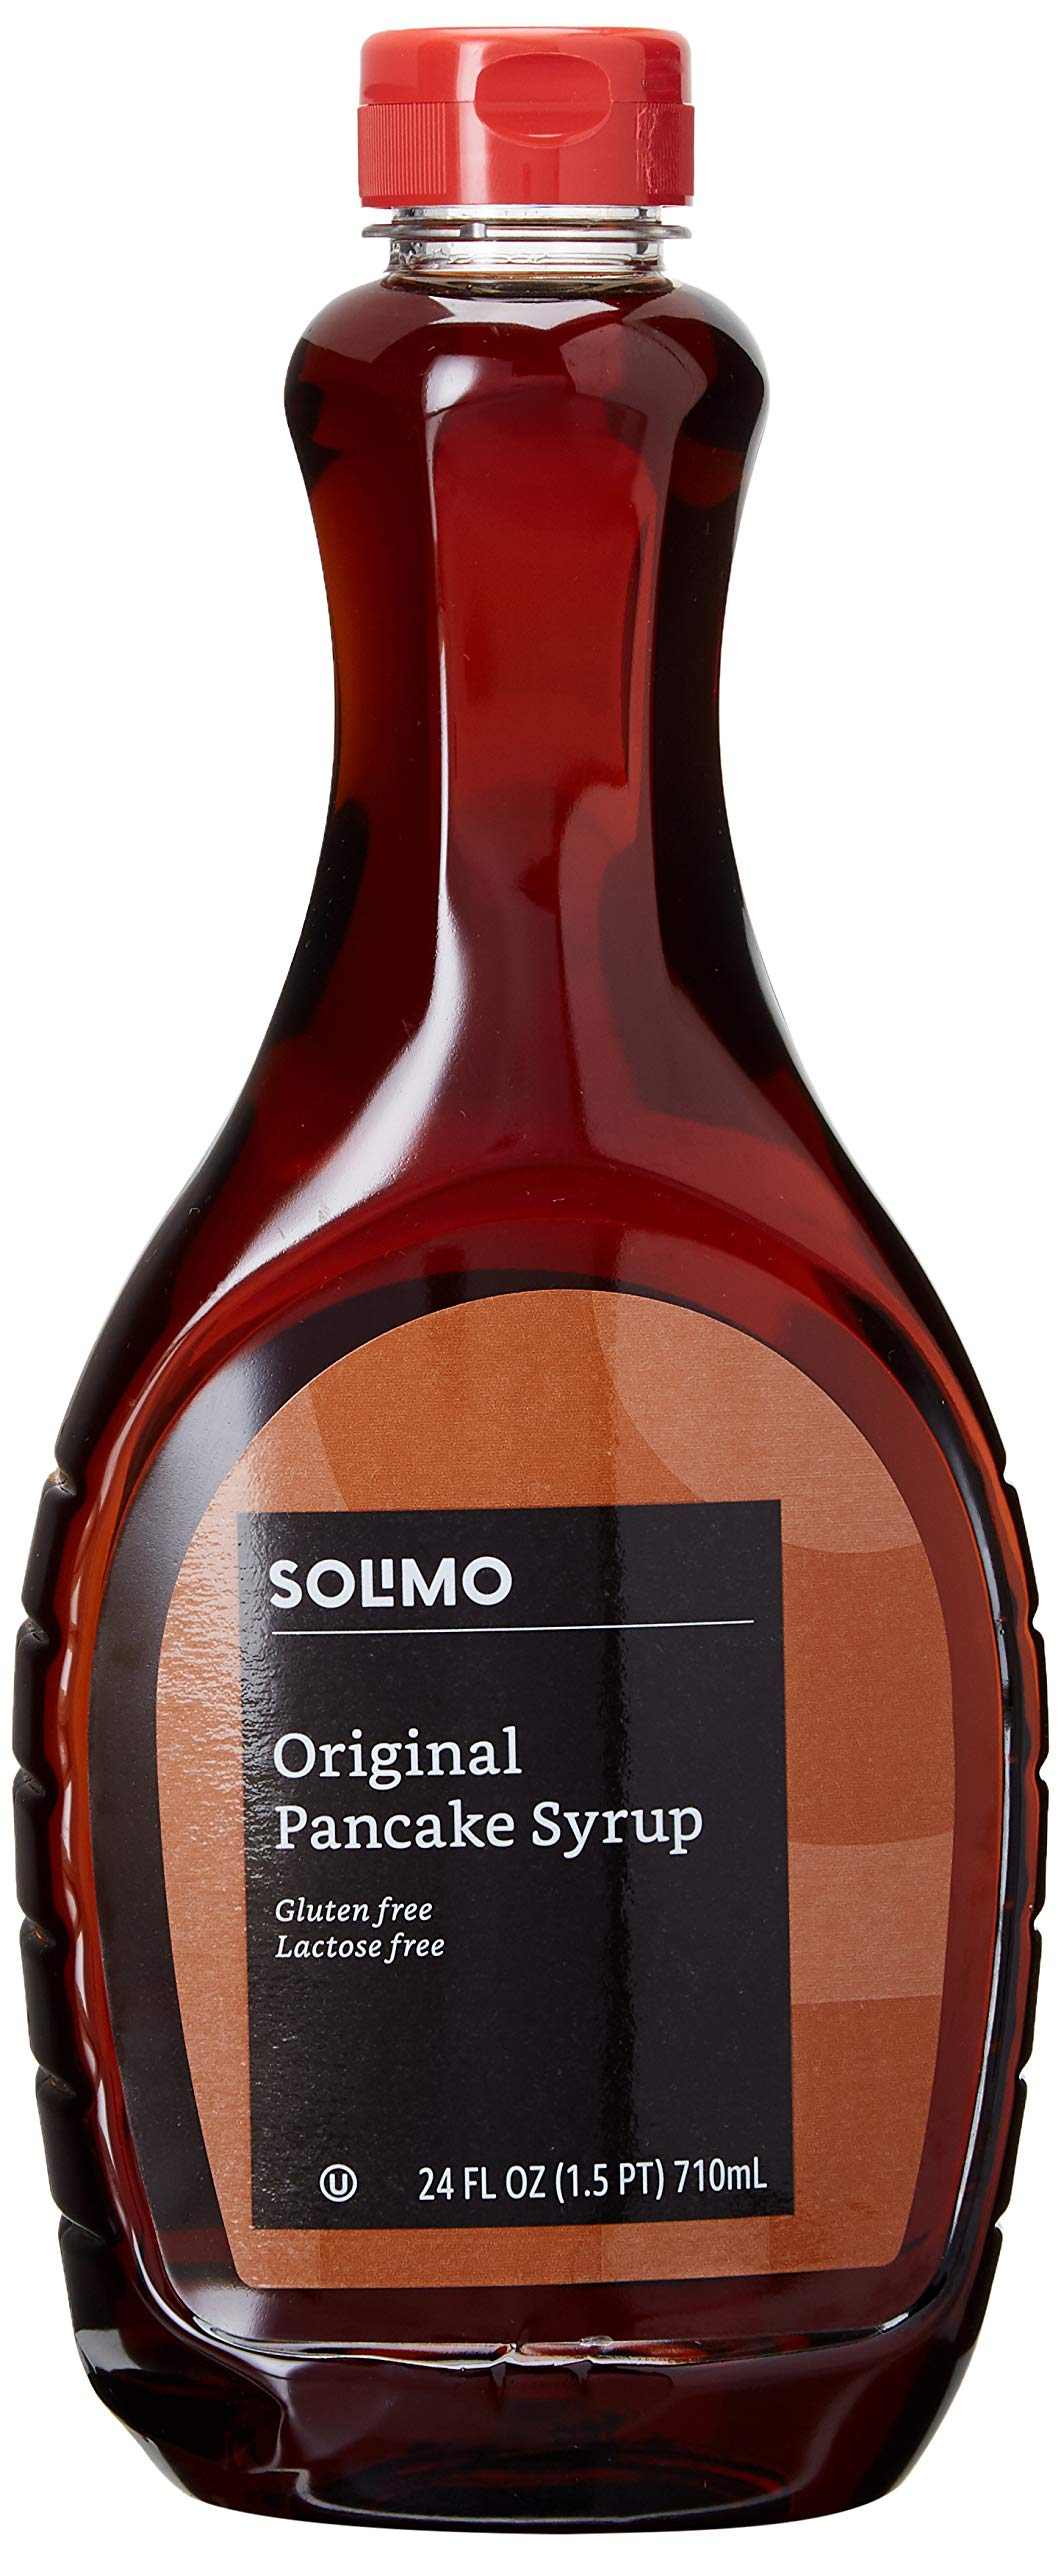 Amazon Brand - Solimo Pancake Syrup, Original Flavor, 24 ounces